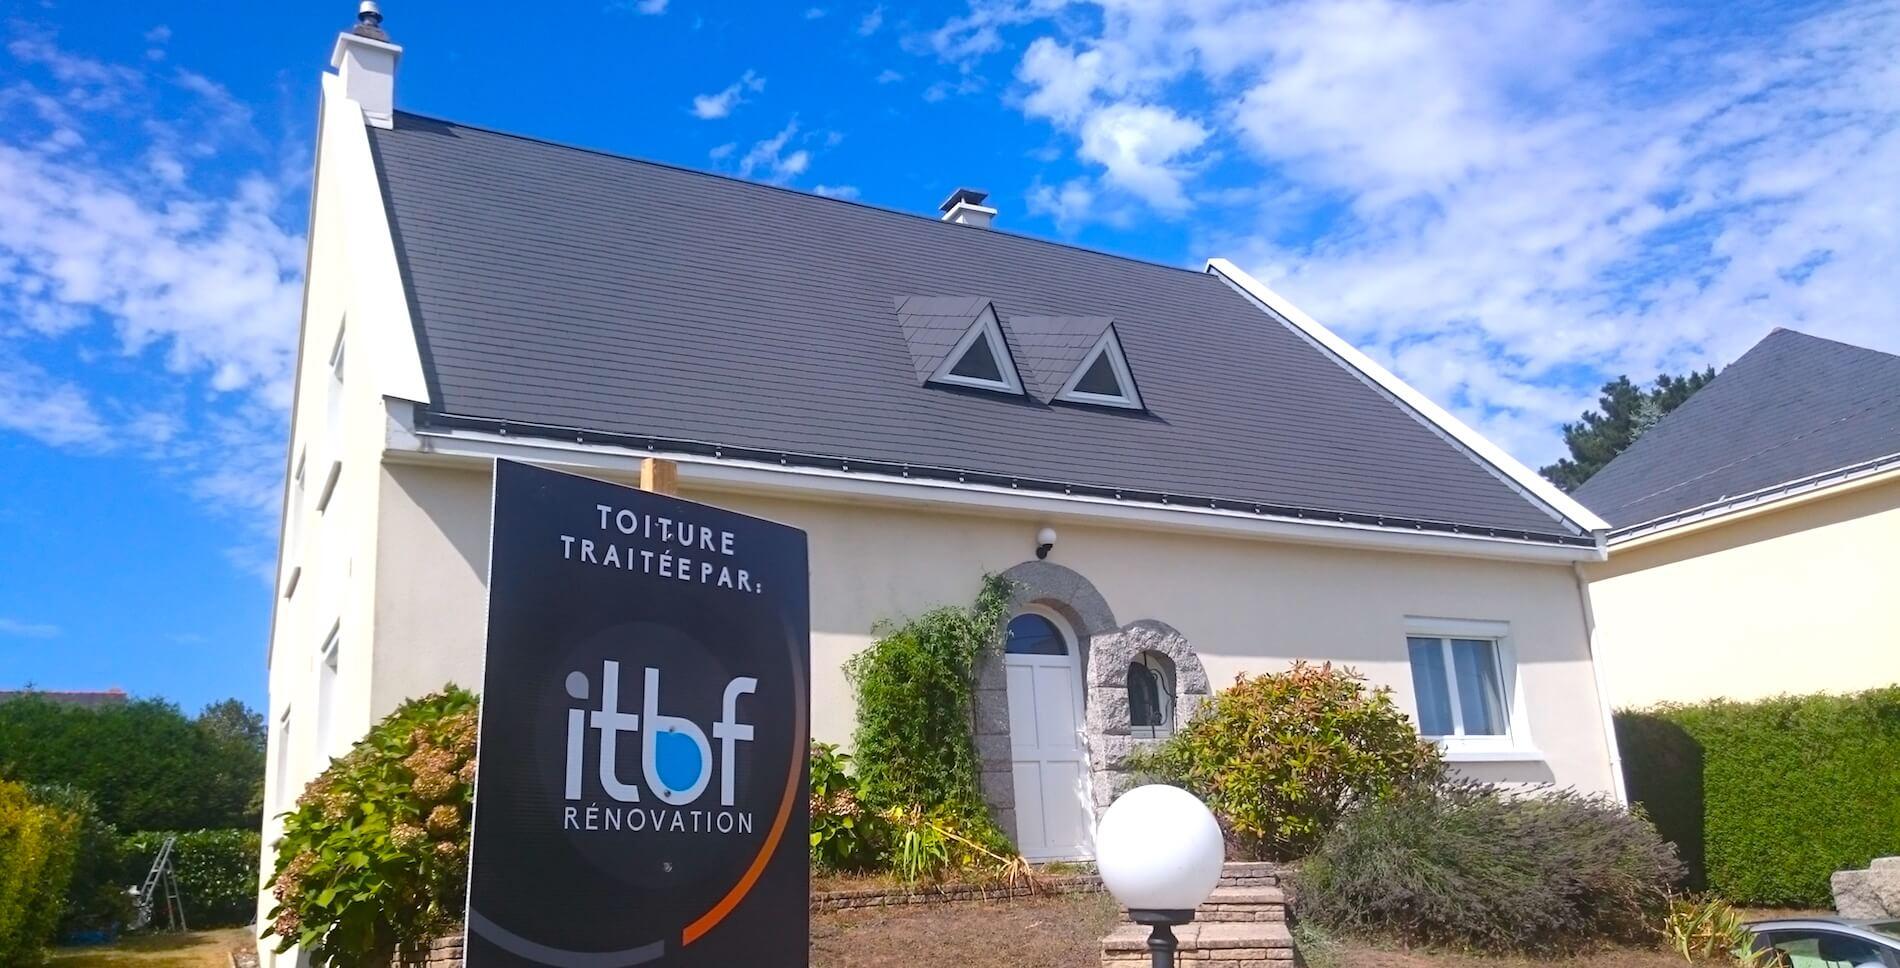 itbf renovation